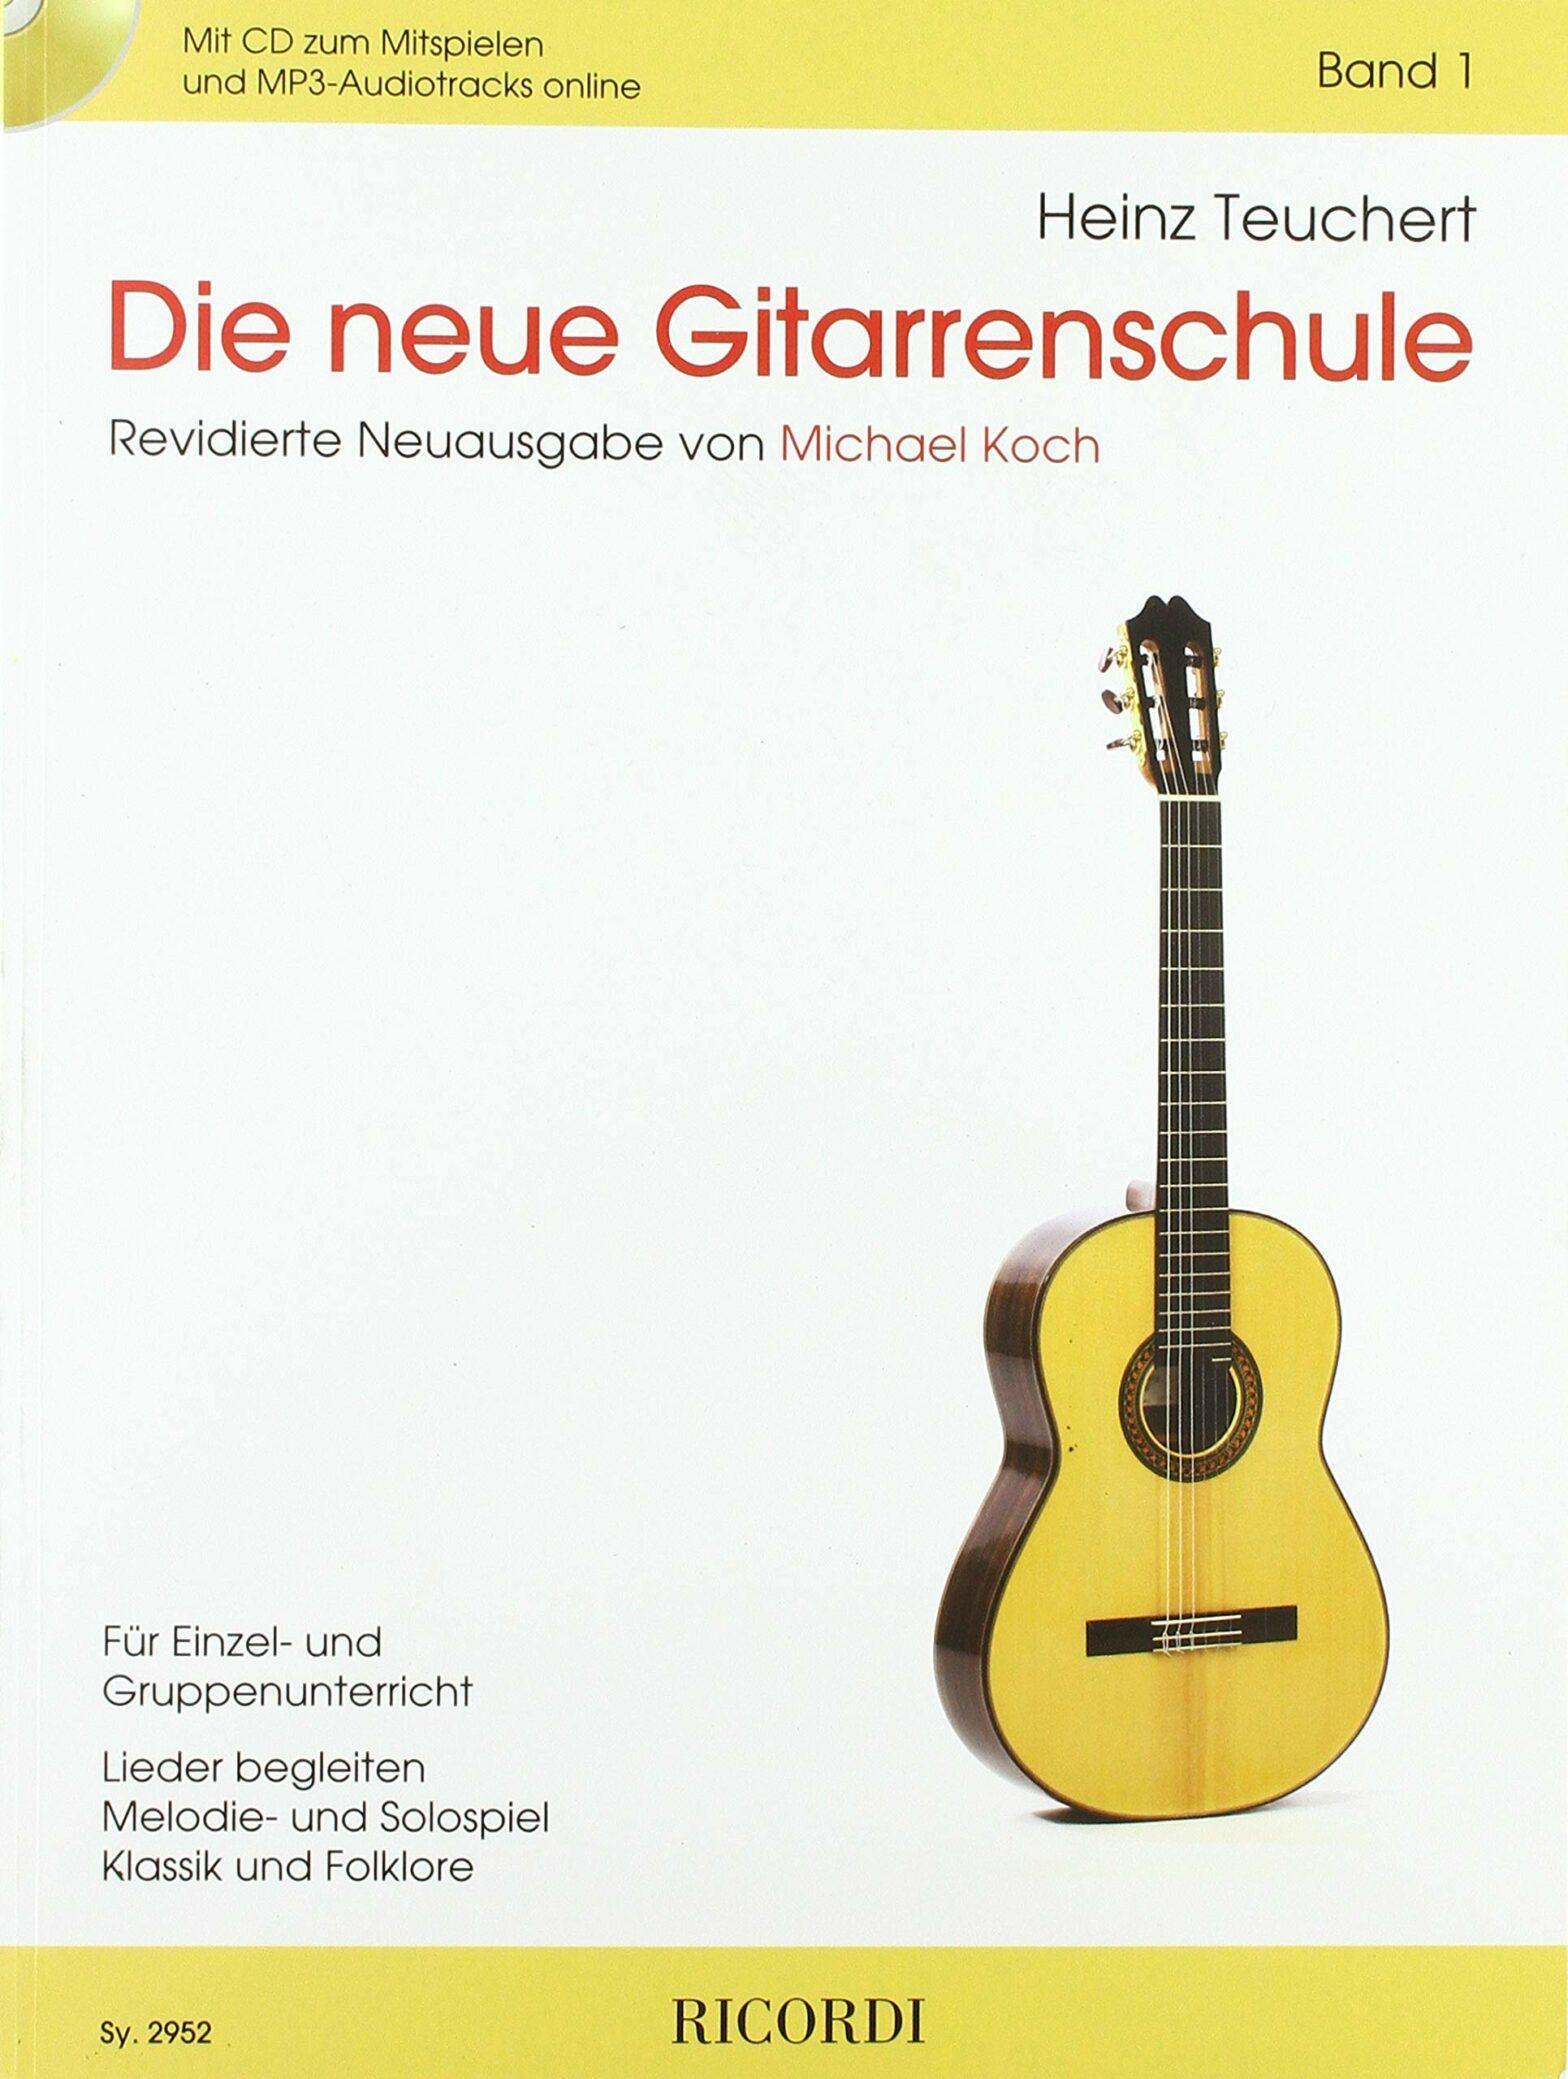 Gitarrenbibel - Die neue Gitarrenschule